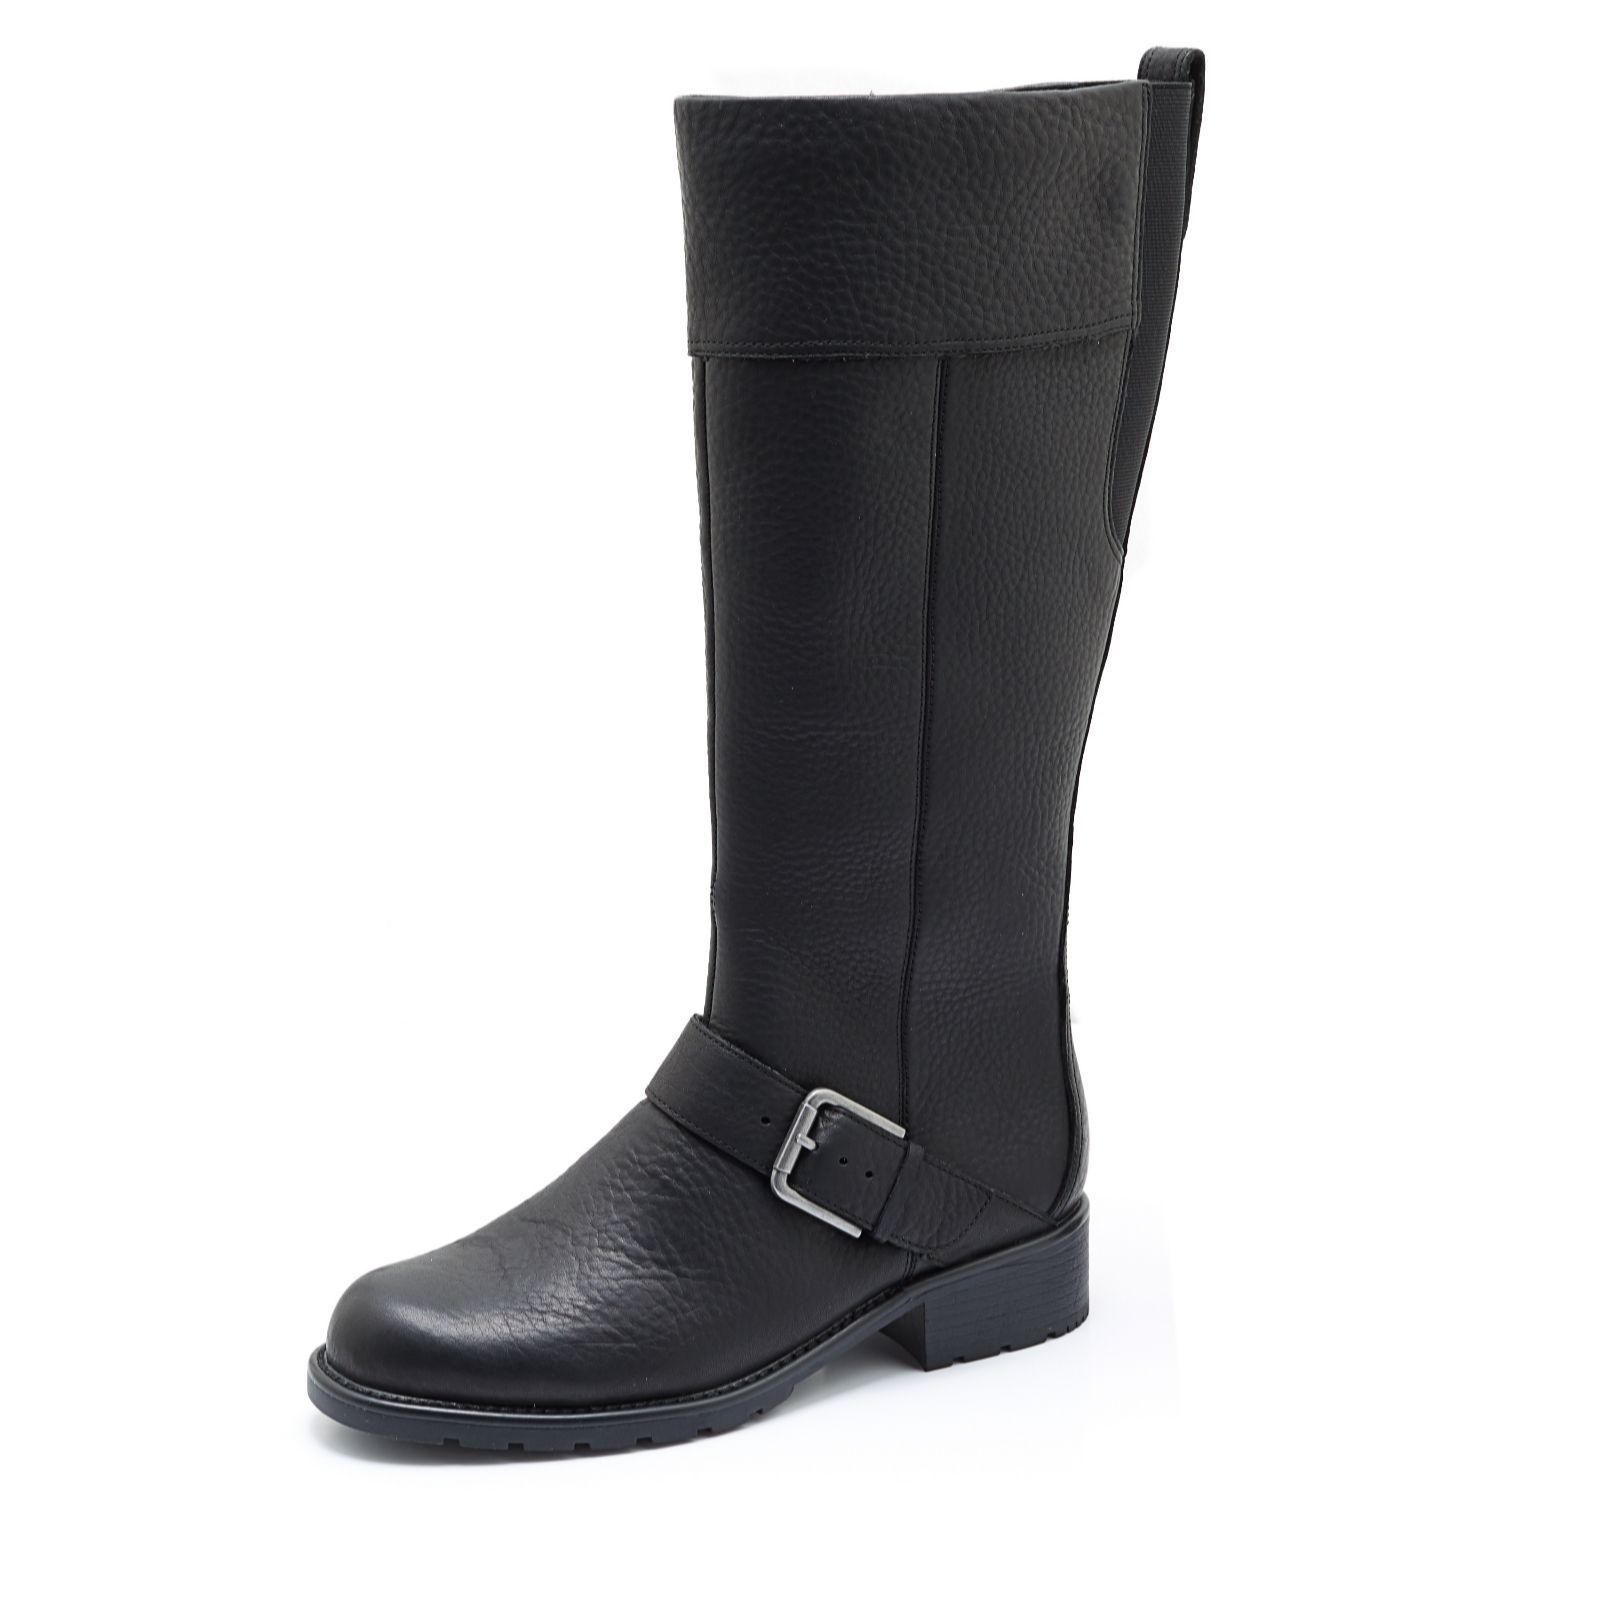 a5b77975829 Clarks Orinoco Jazz Knee High Boot - QVC UK